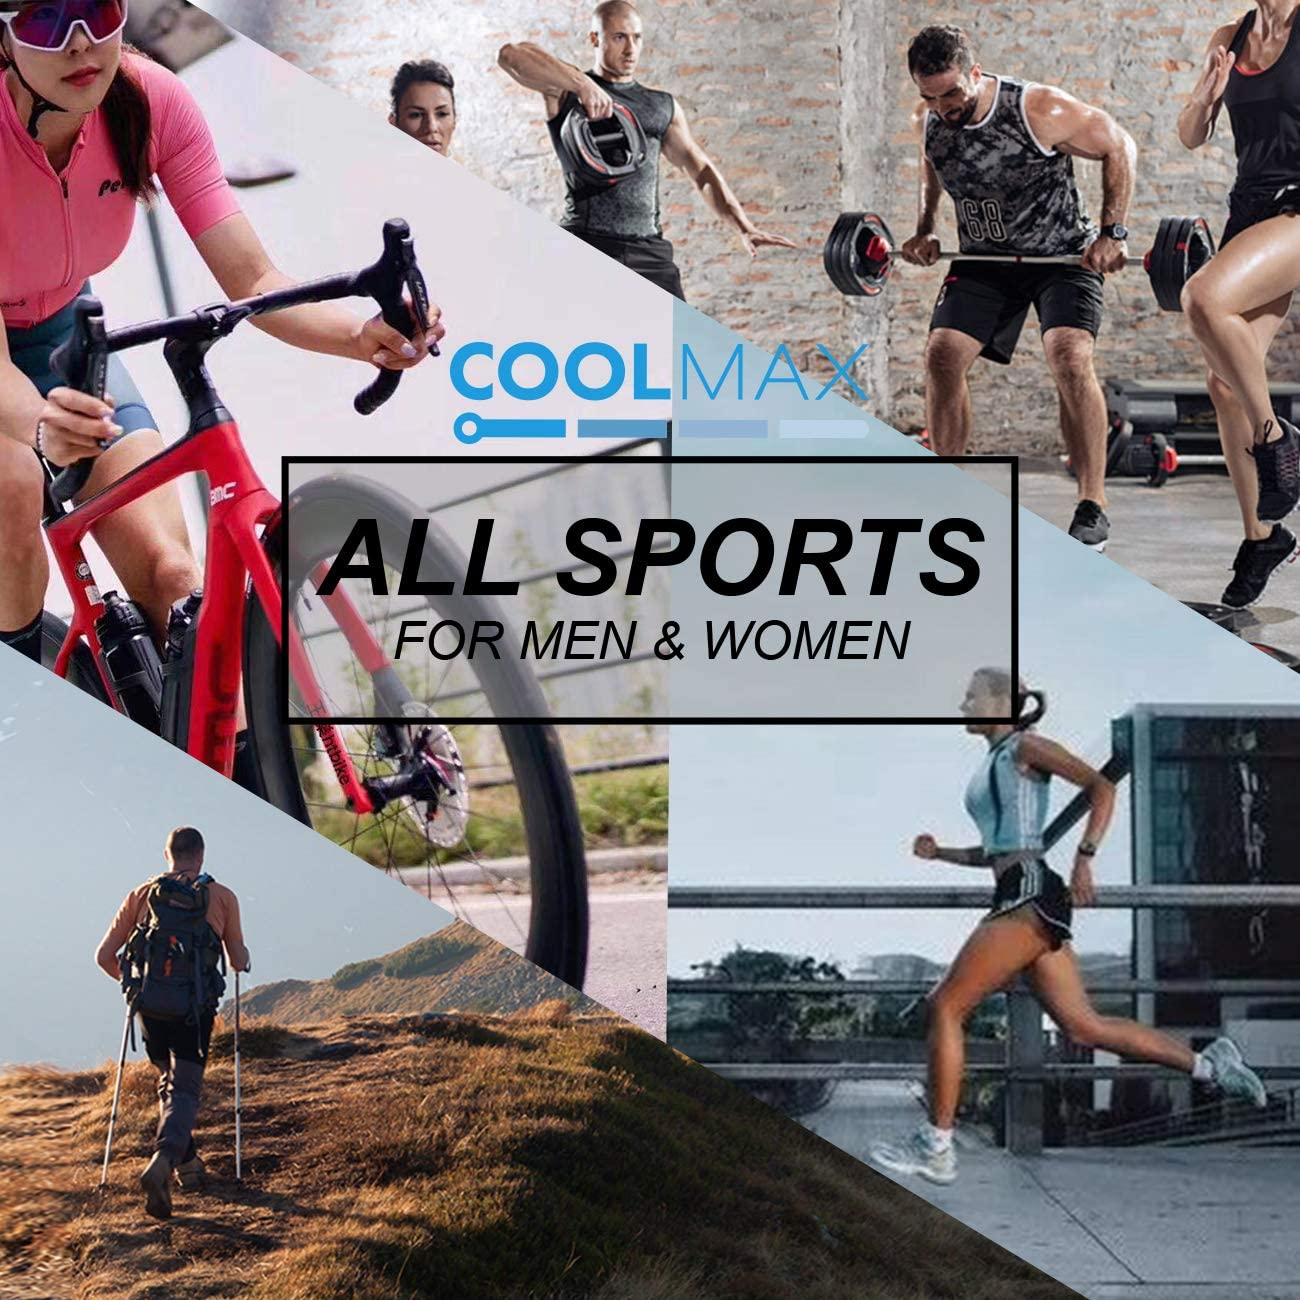 5 pairs Crew Socks COOLMAX Brand Performance Mild Compression Support 15-18mmHg for Men /& Women Socks